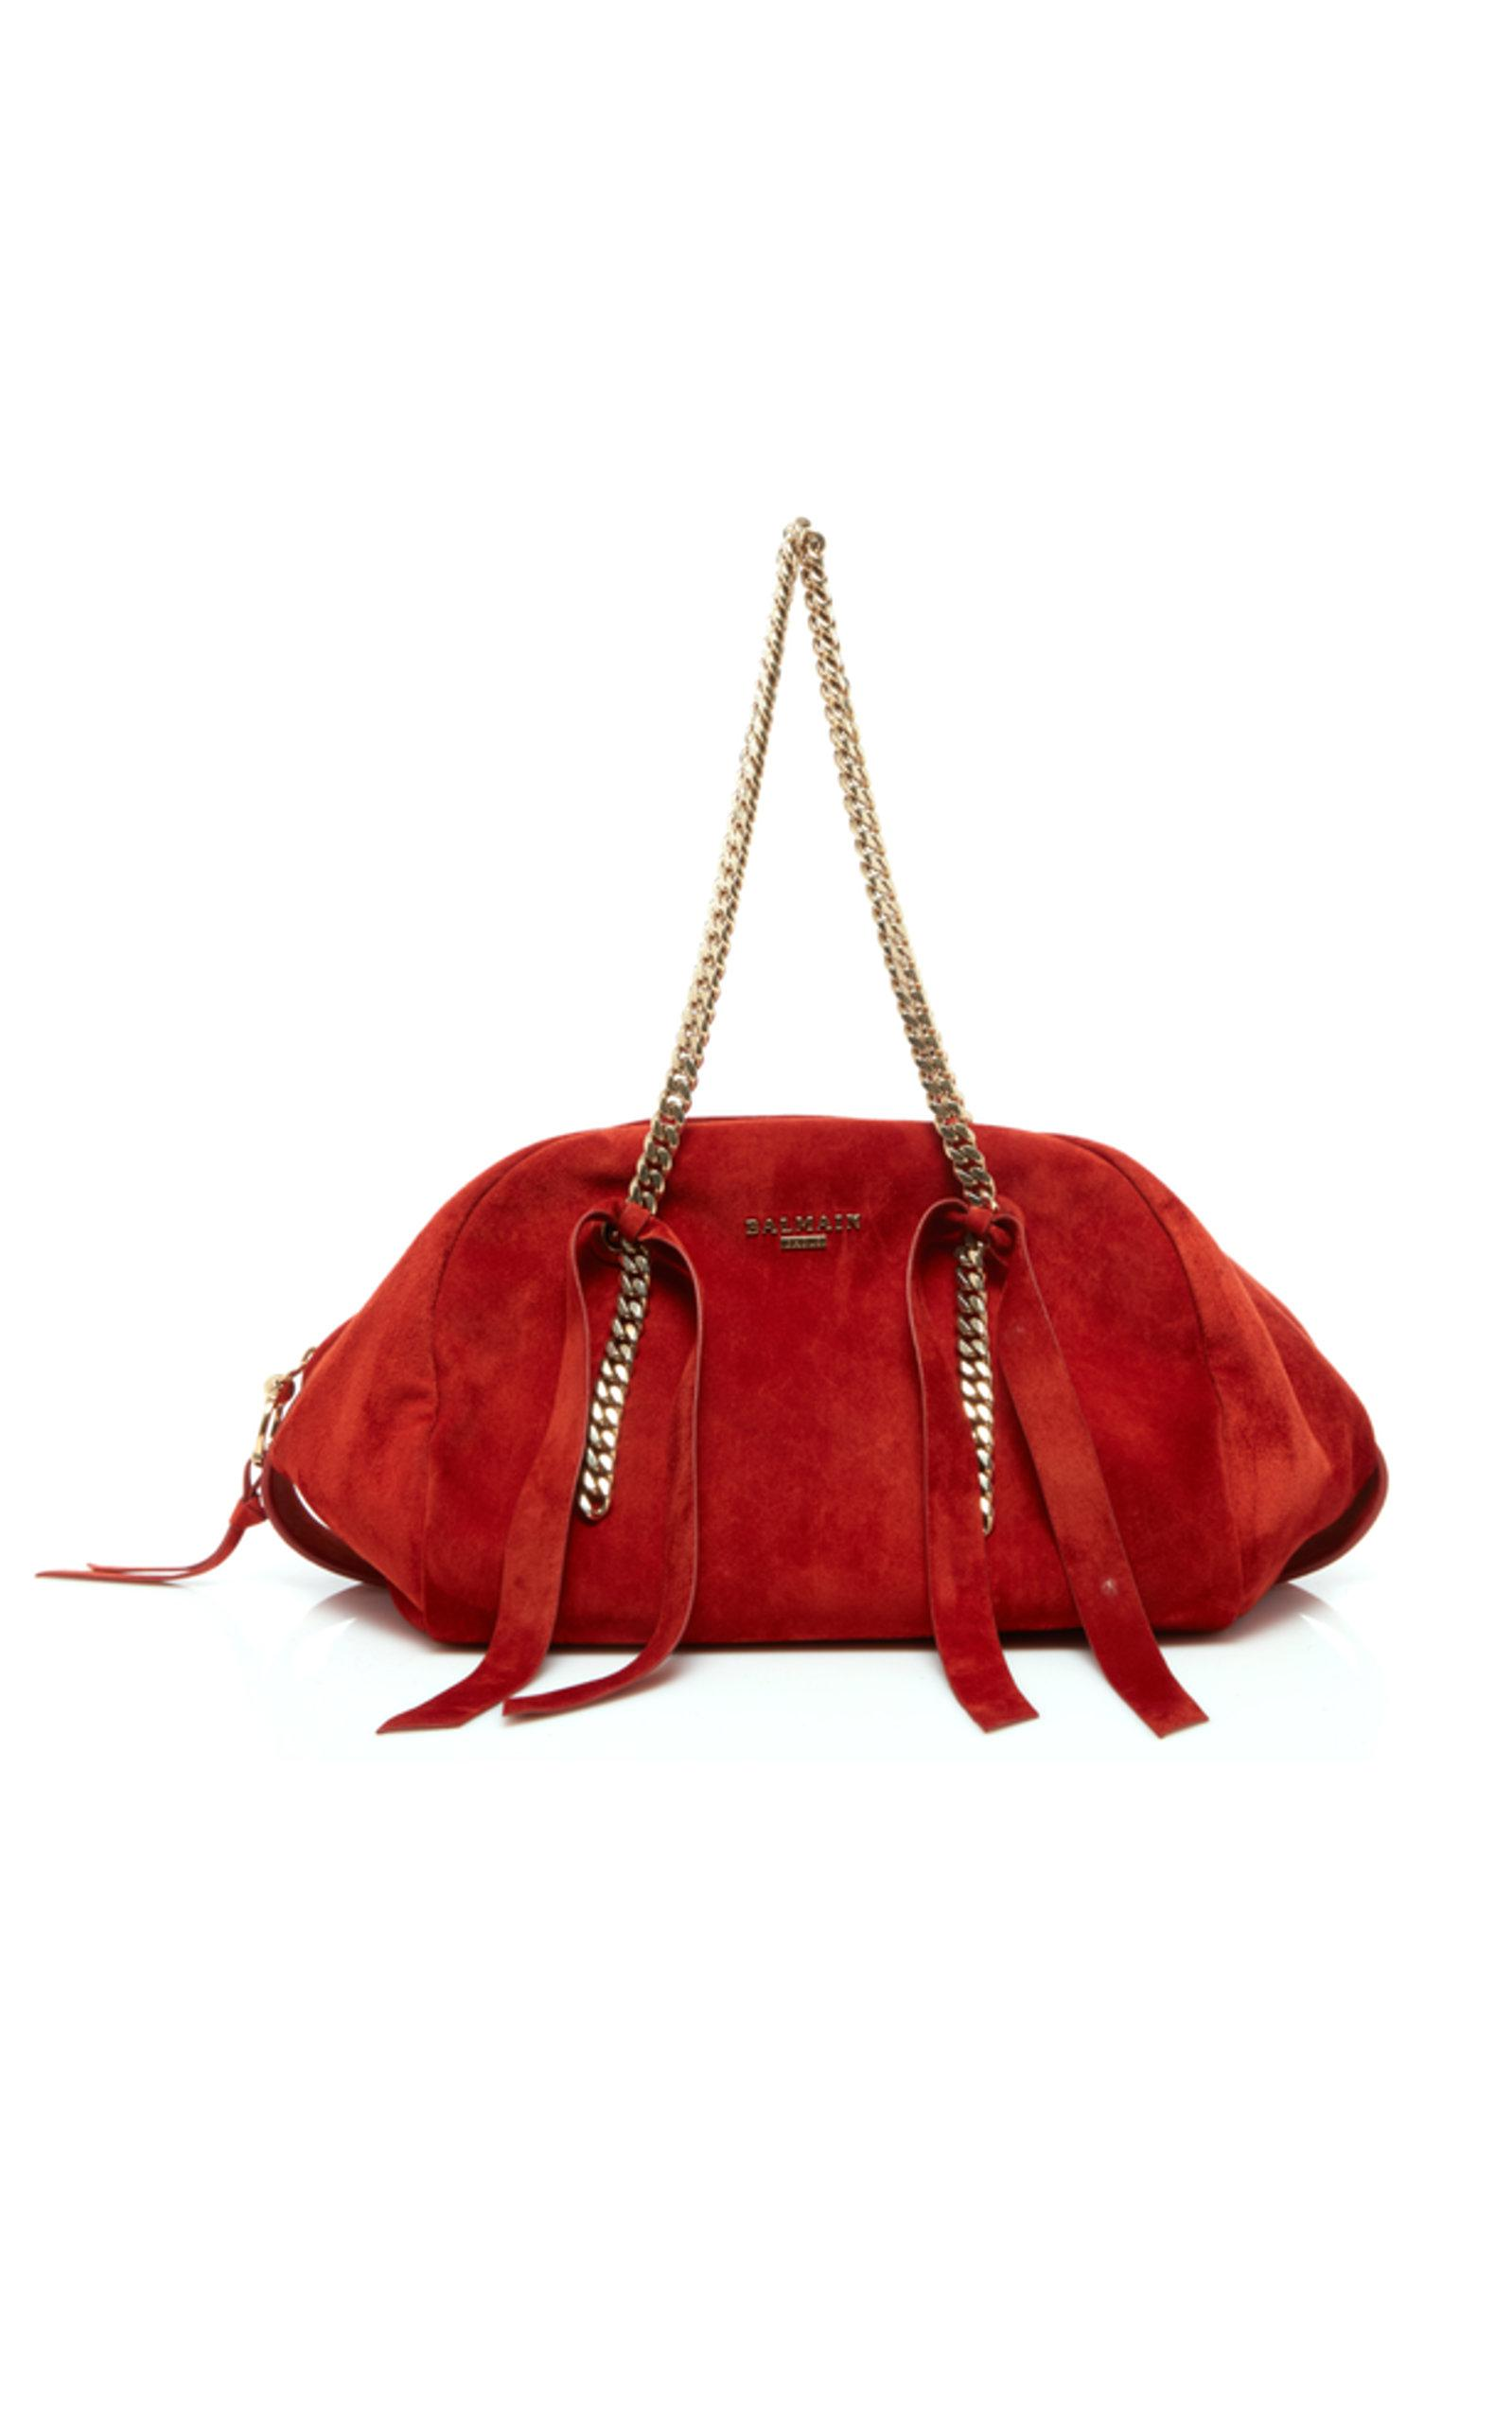 a9de7185aa3 Lyst - Balmain Suede Medium Moon Bowling Bag in Red